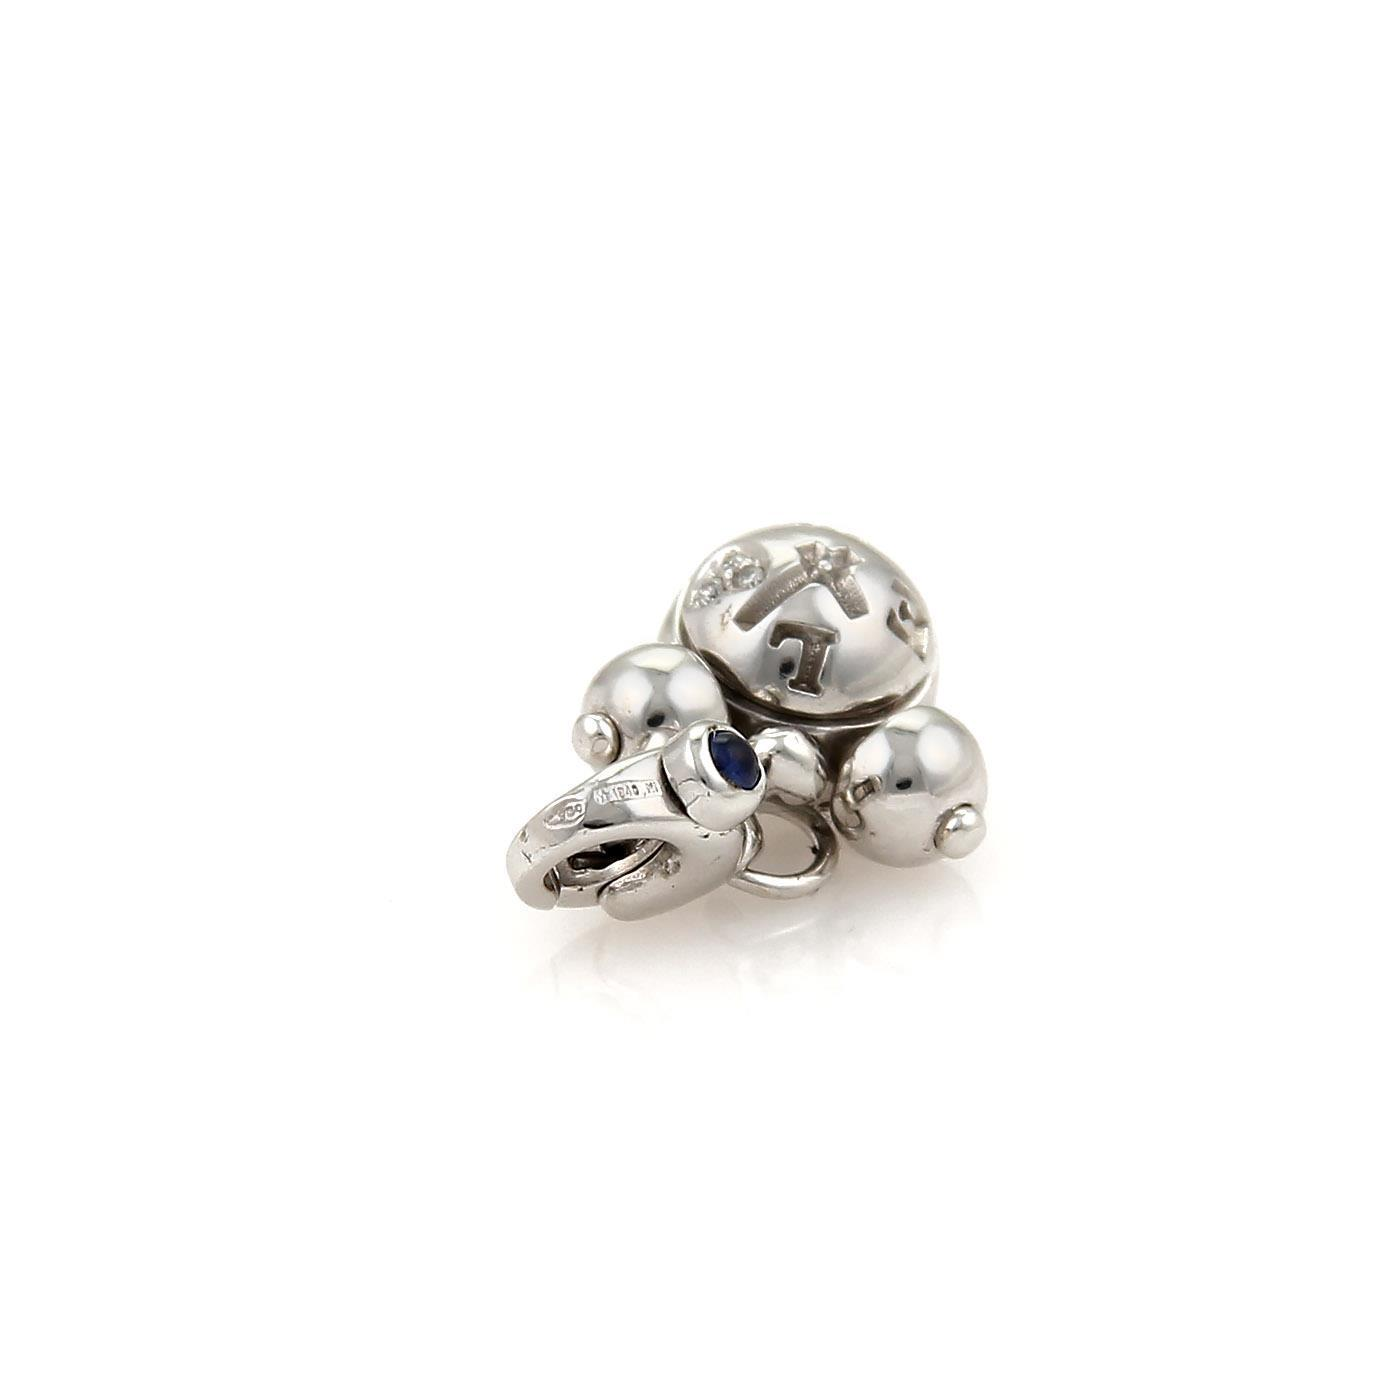 """""Pasquale Bruni 18K White Gold with Diamond & Sapphire Charm Pendant"""""" 2174326"